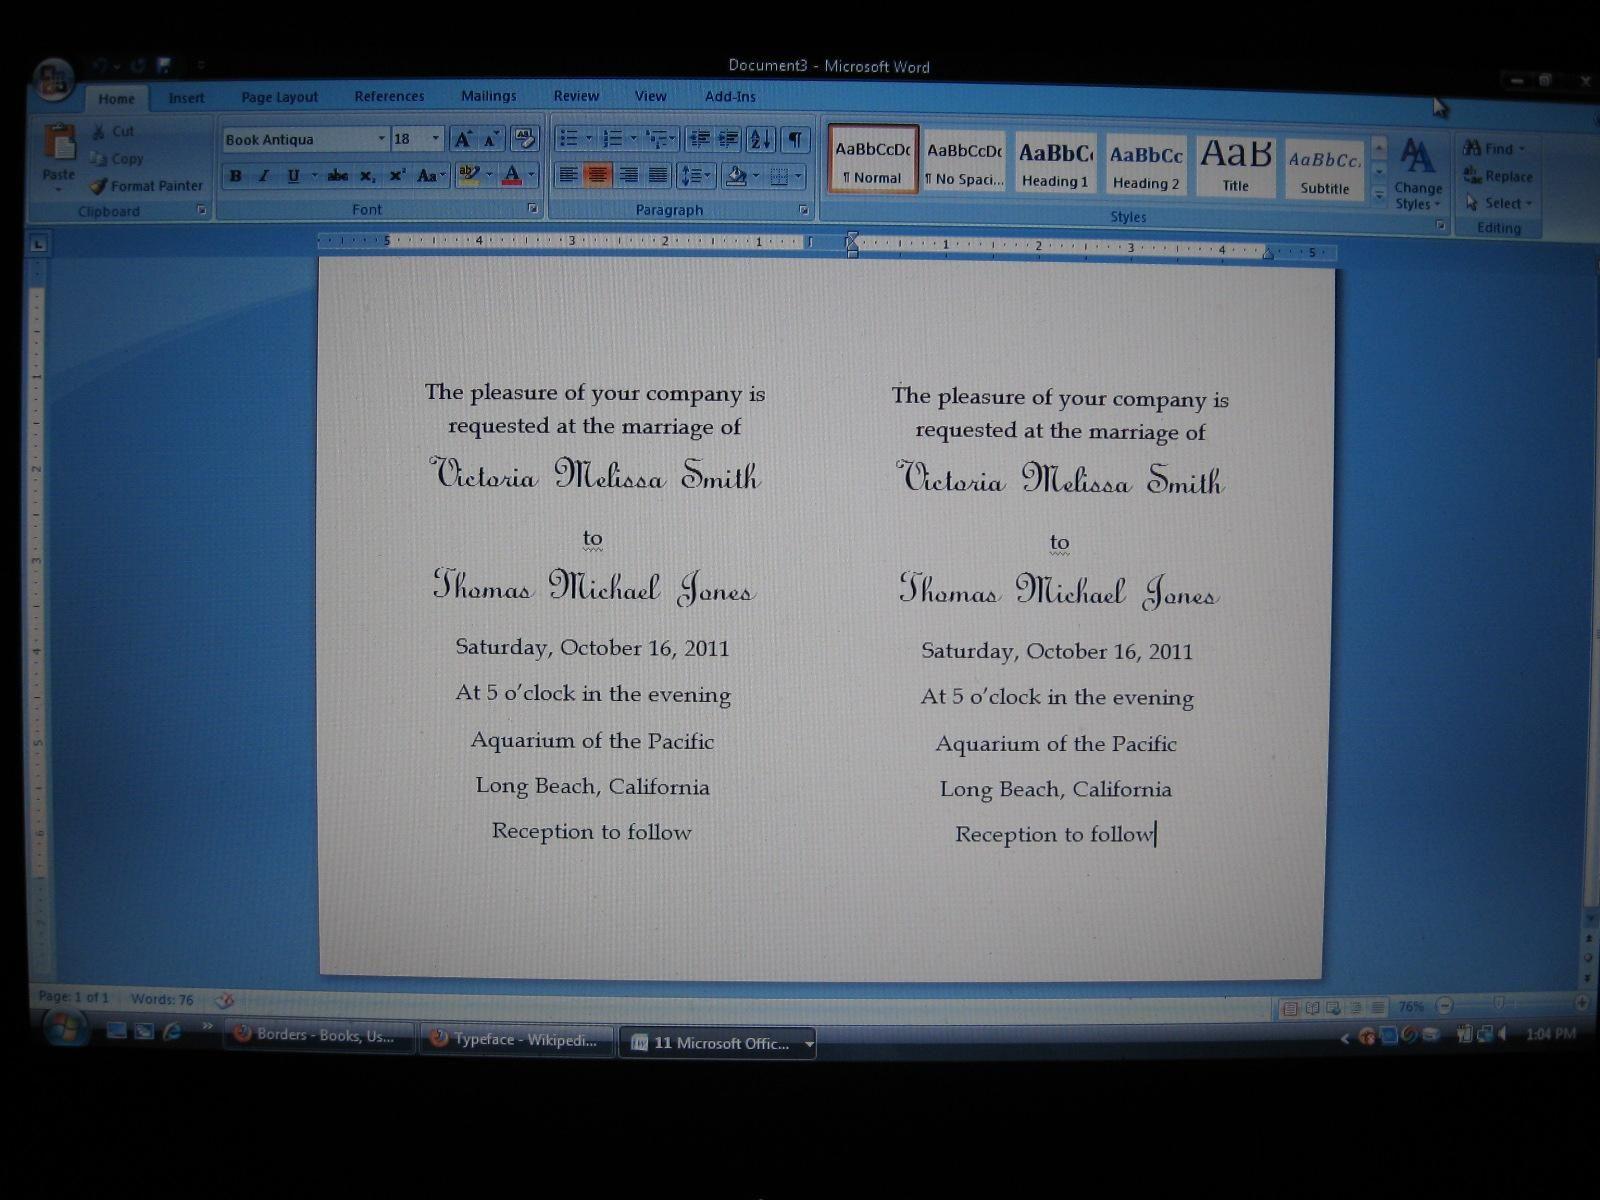 diy wedding invitations simple wedding invitations using microsoft word - Wedding Invitation Software